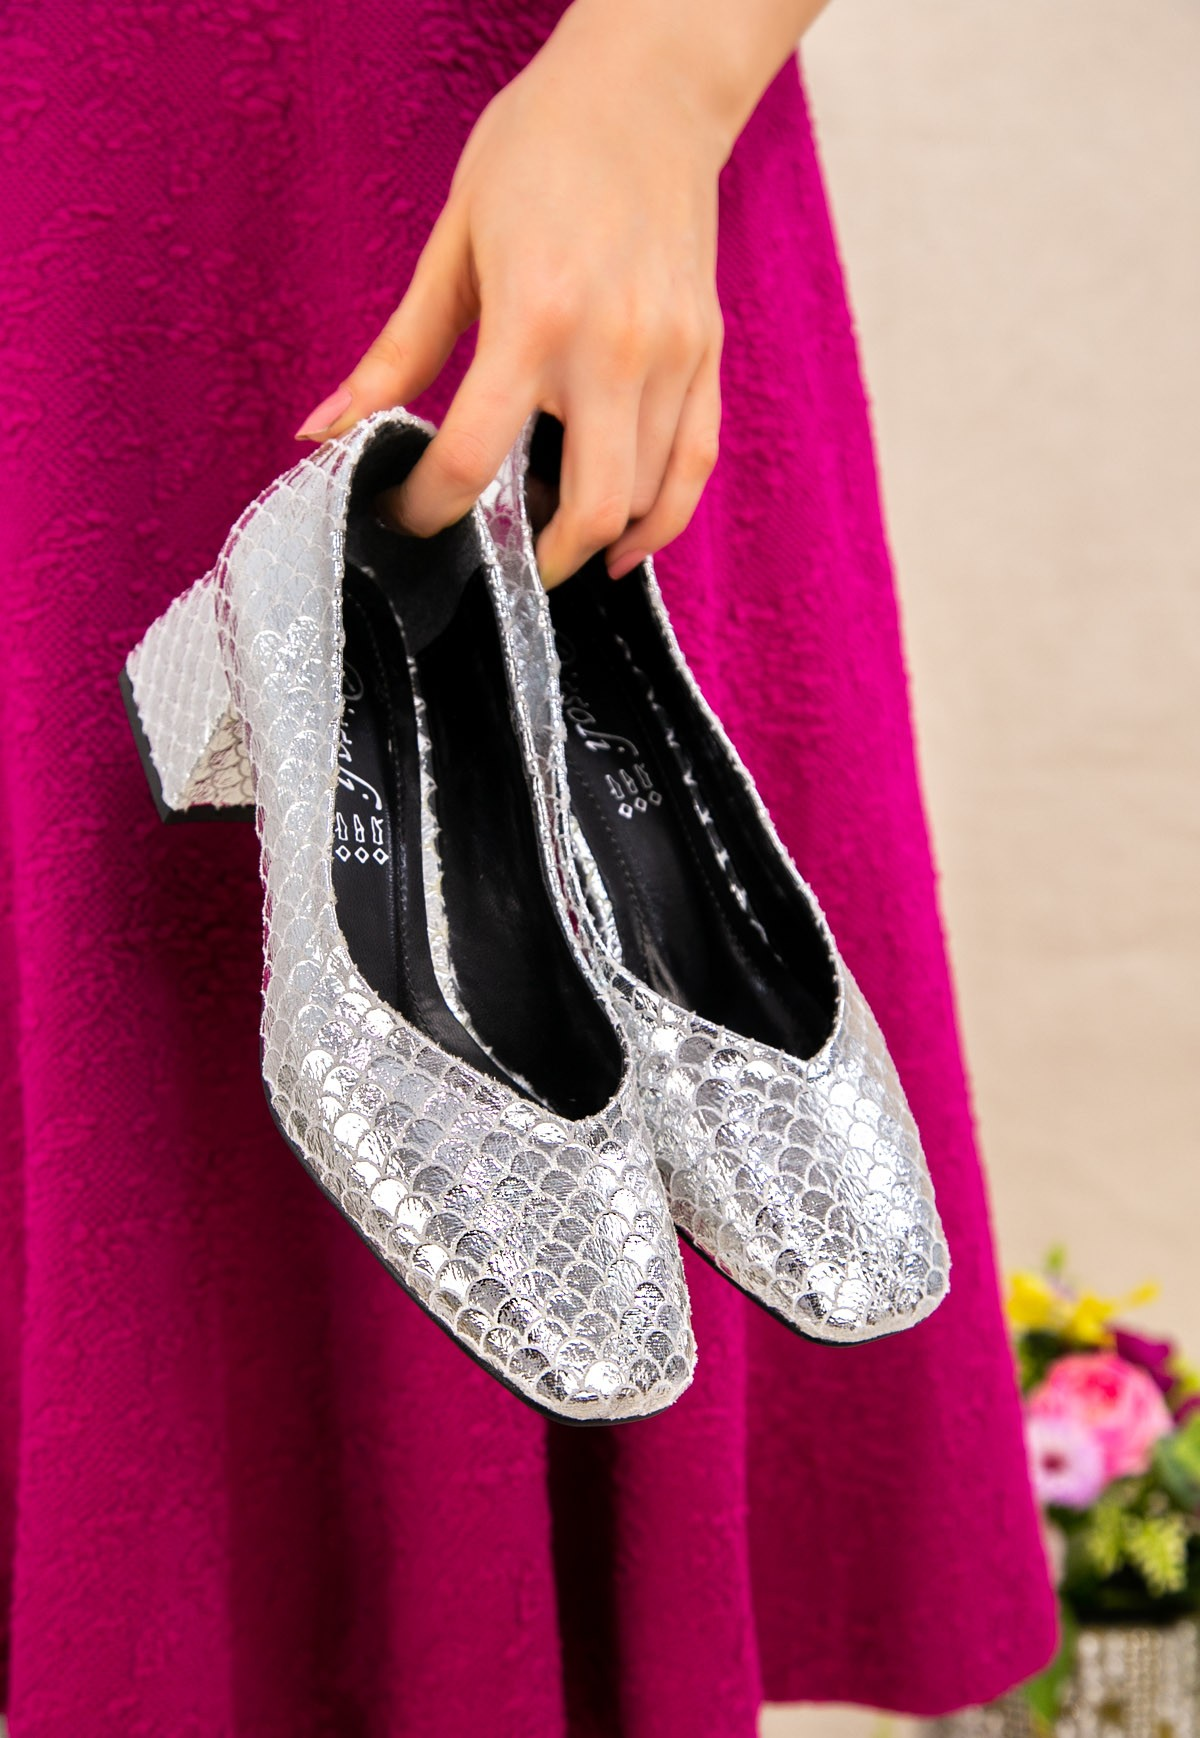 Modi Silber Dekoriert Heels Schuhe נעלי אופנה חדשות лучшее за 2021 год Mode